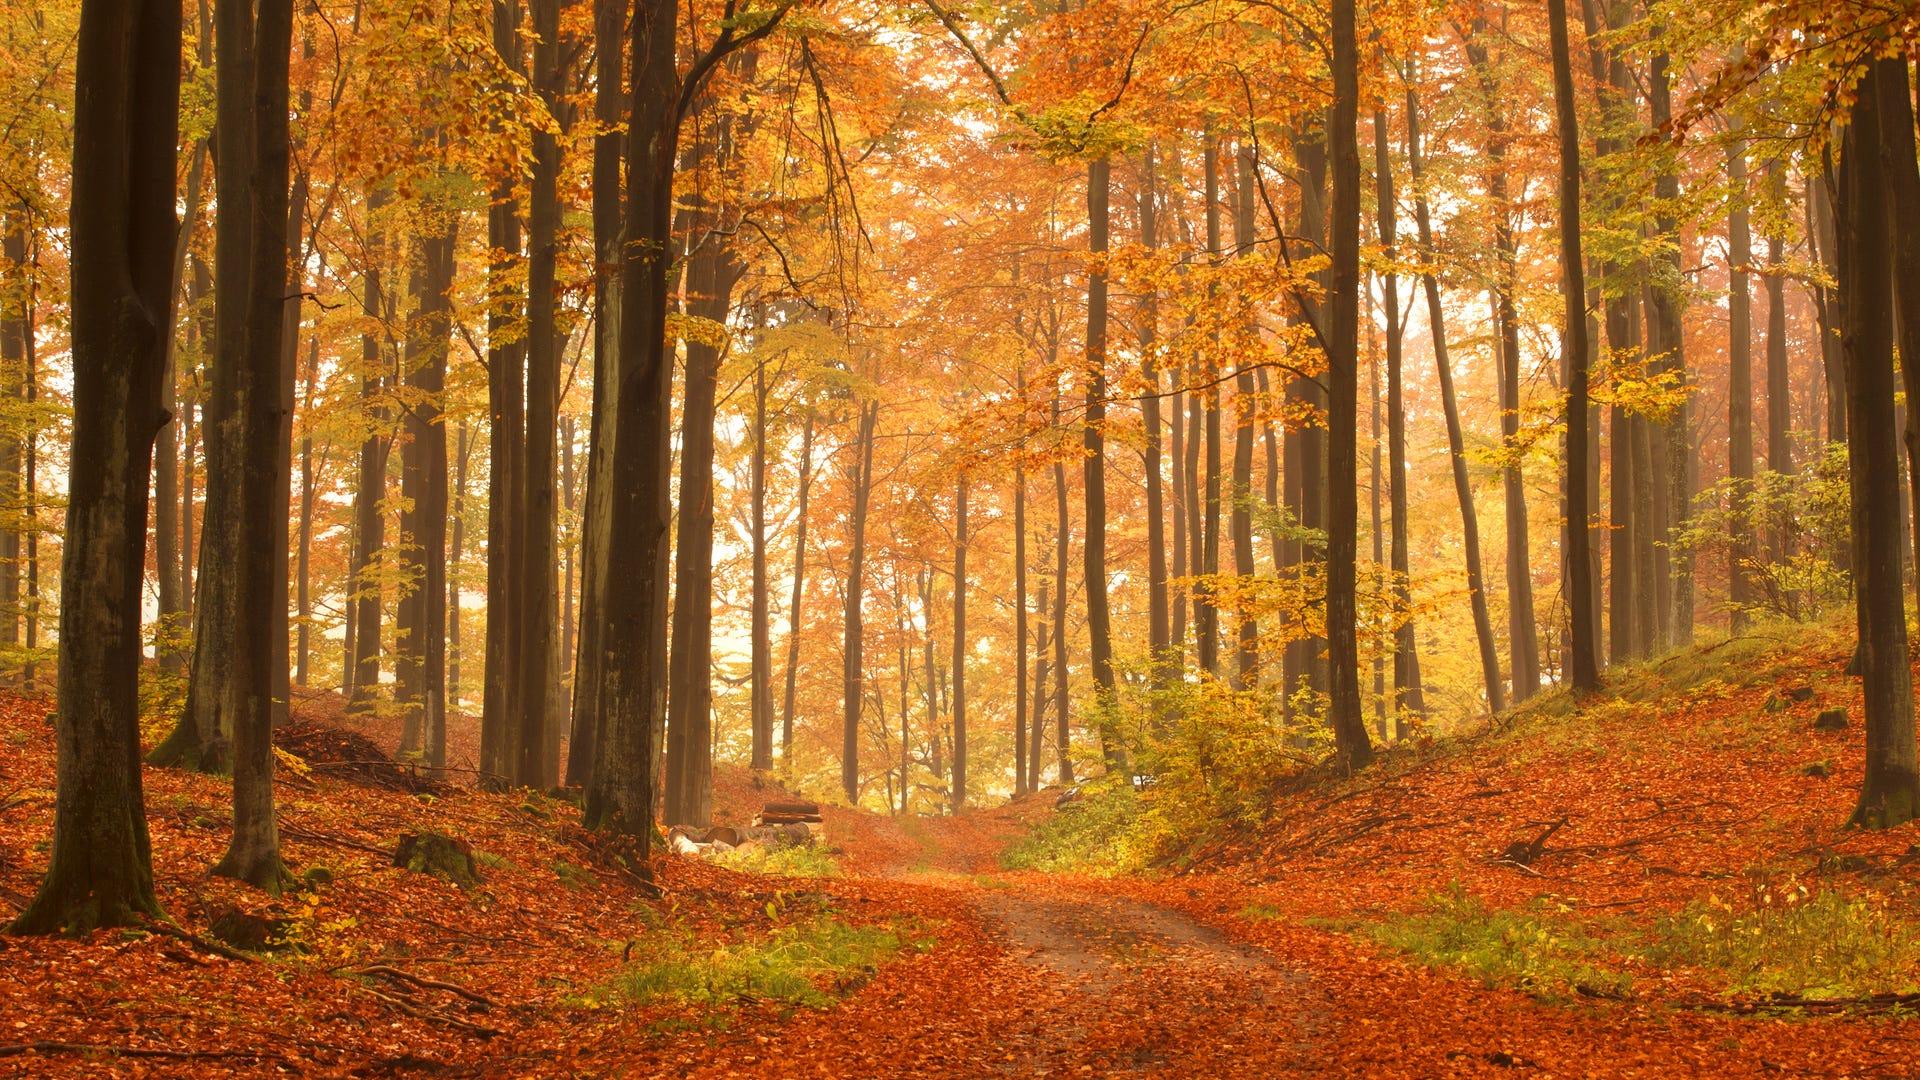 Fall Foliage Photography Tips advise